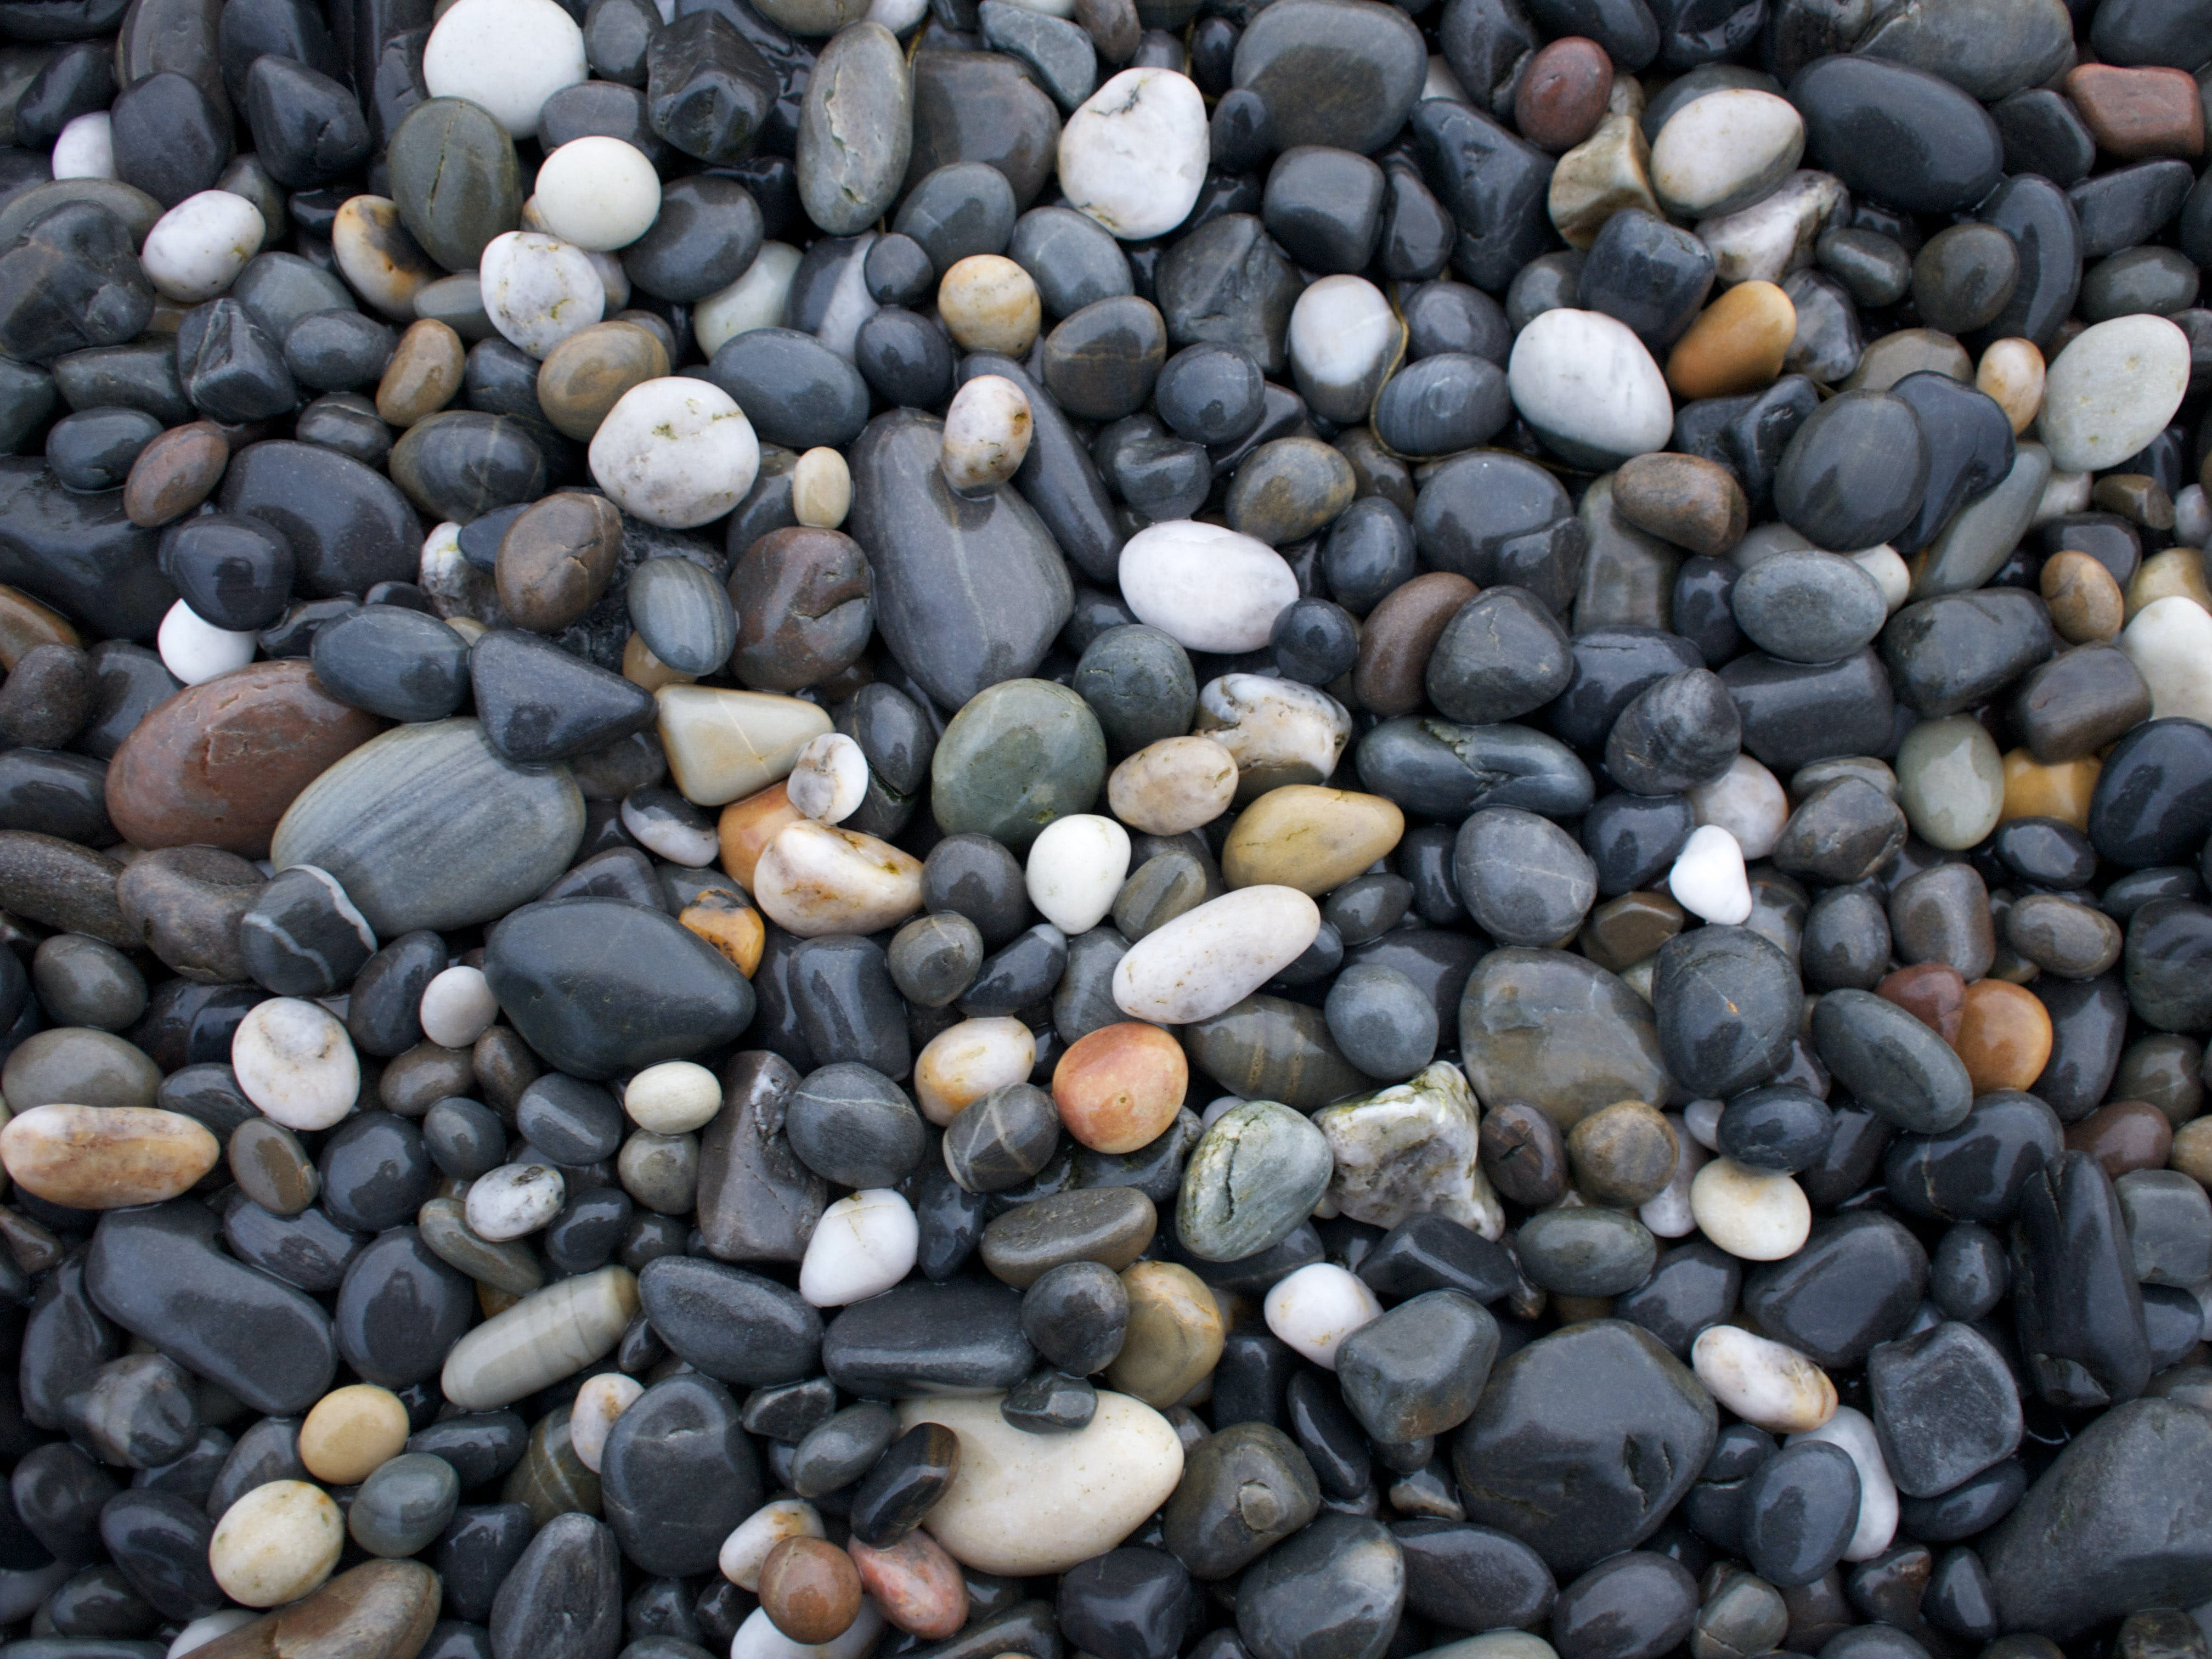 Free stock photo of rocks